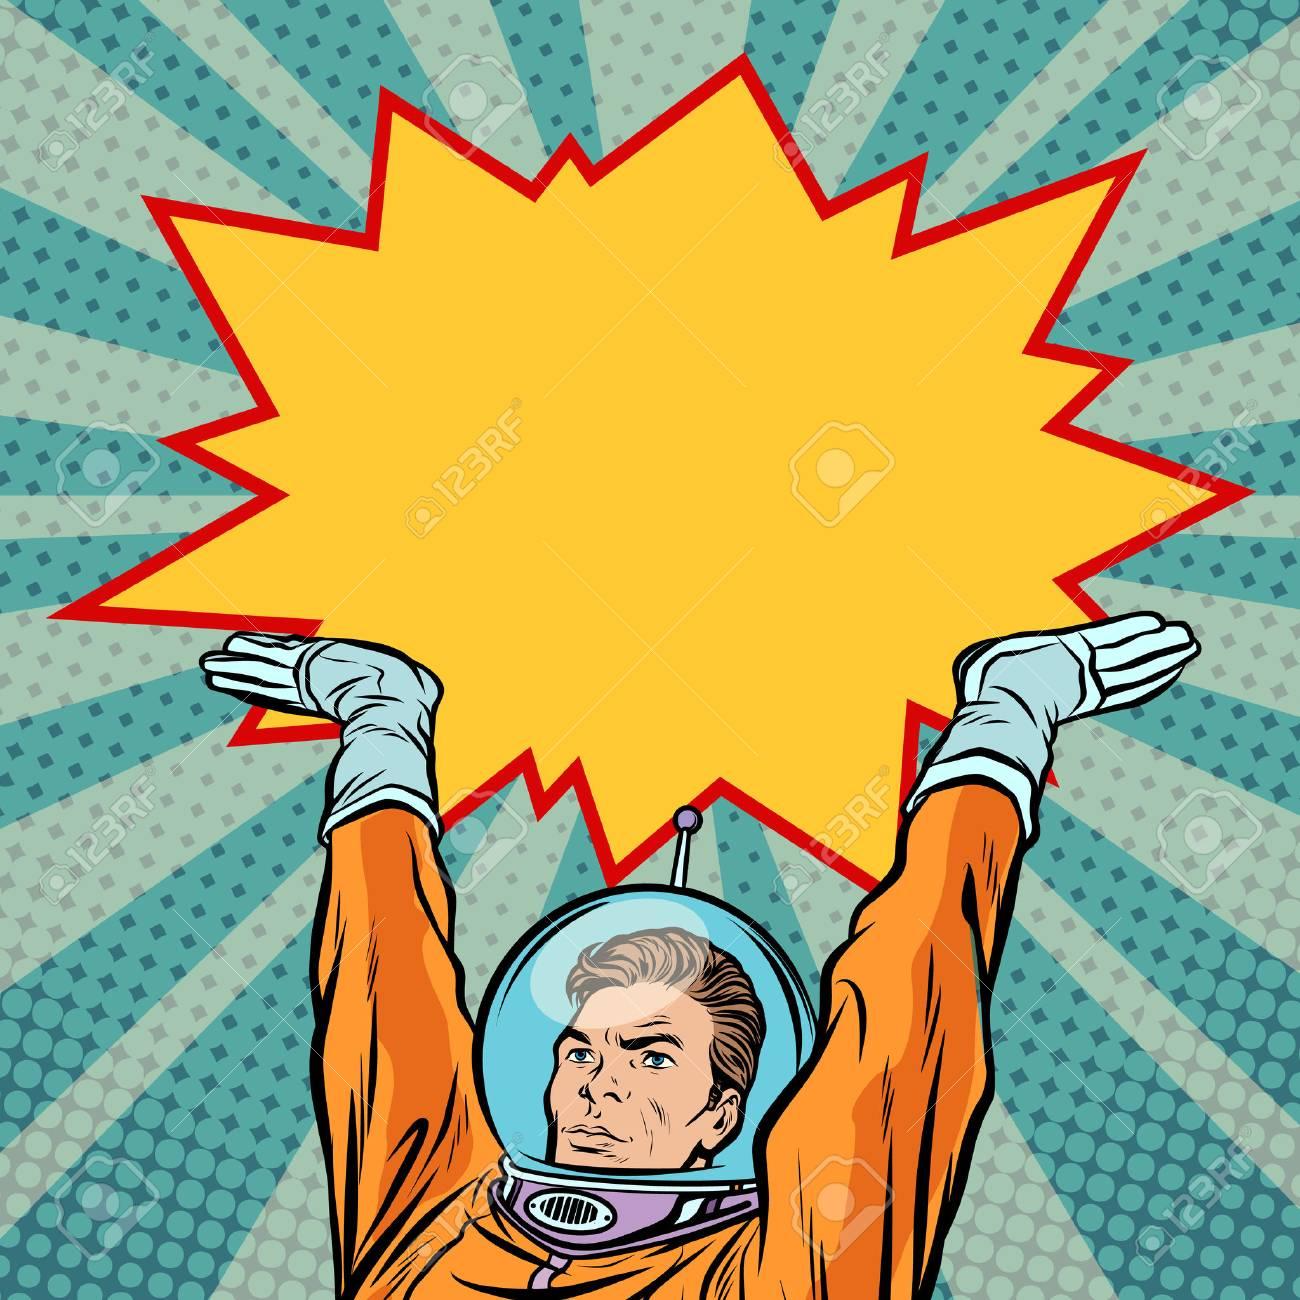 Astronaut holding comic bubble - 89466009